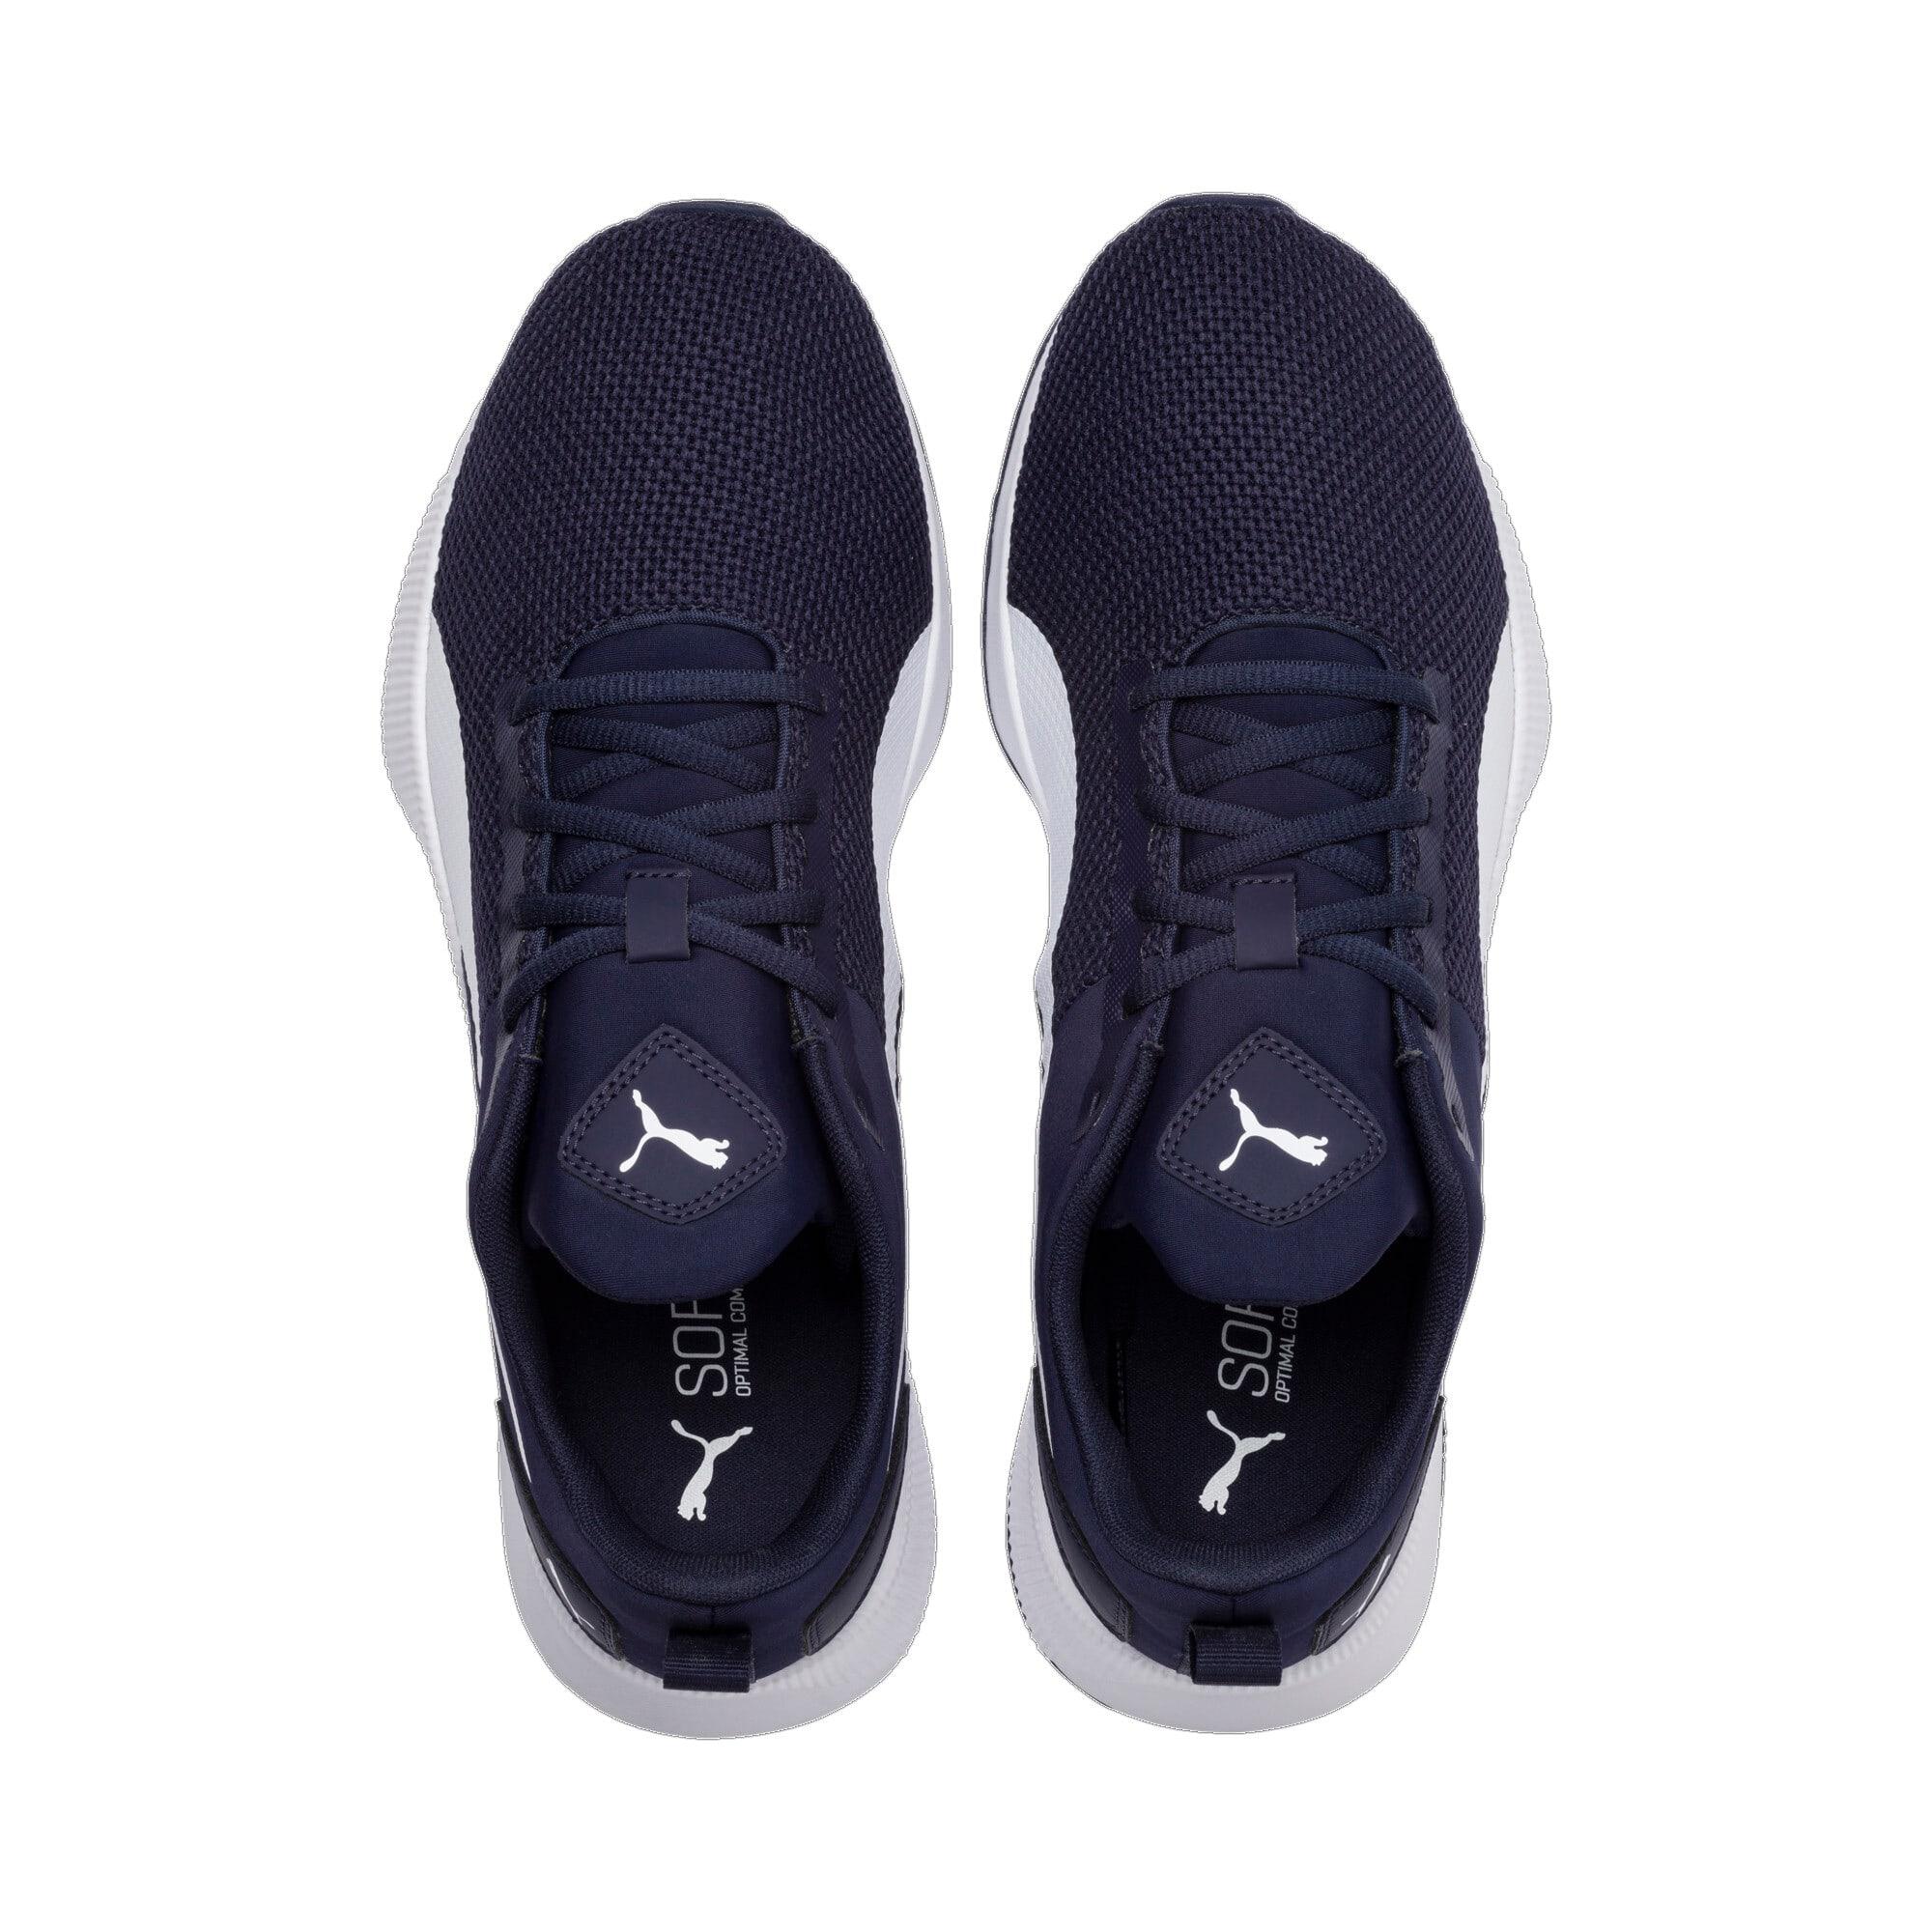 Thumbnail 6 of Flyer Runner Running Shoes, Peacoat-Puma White, medium